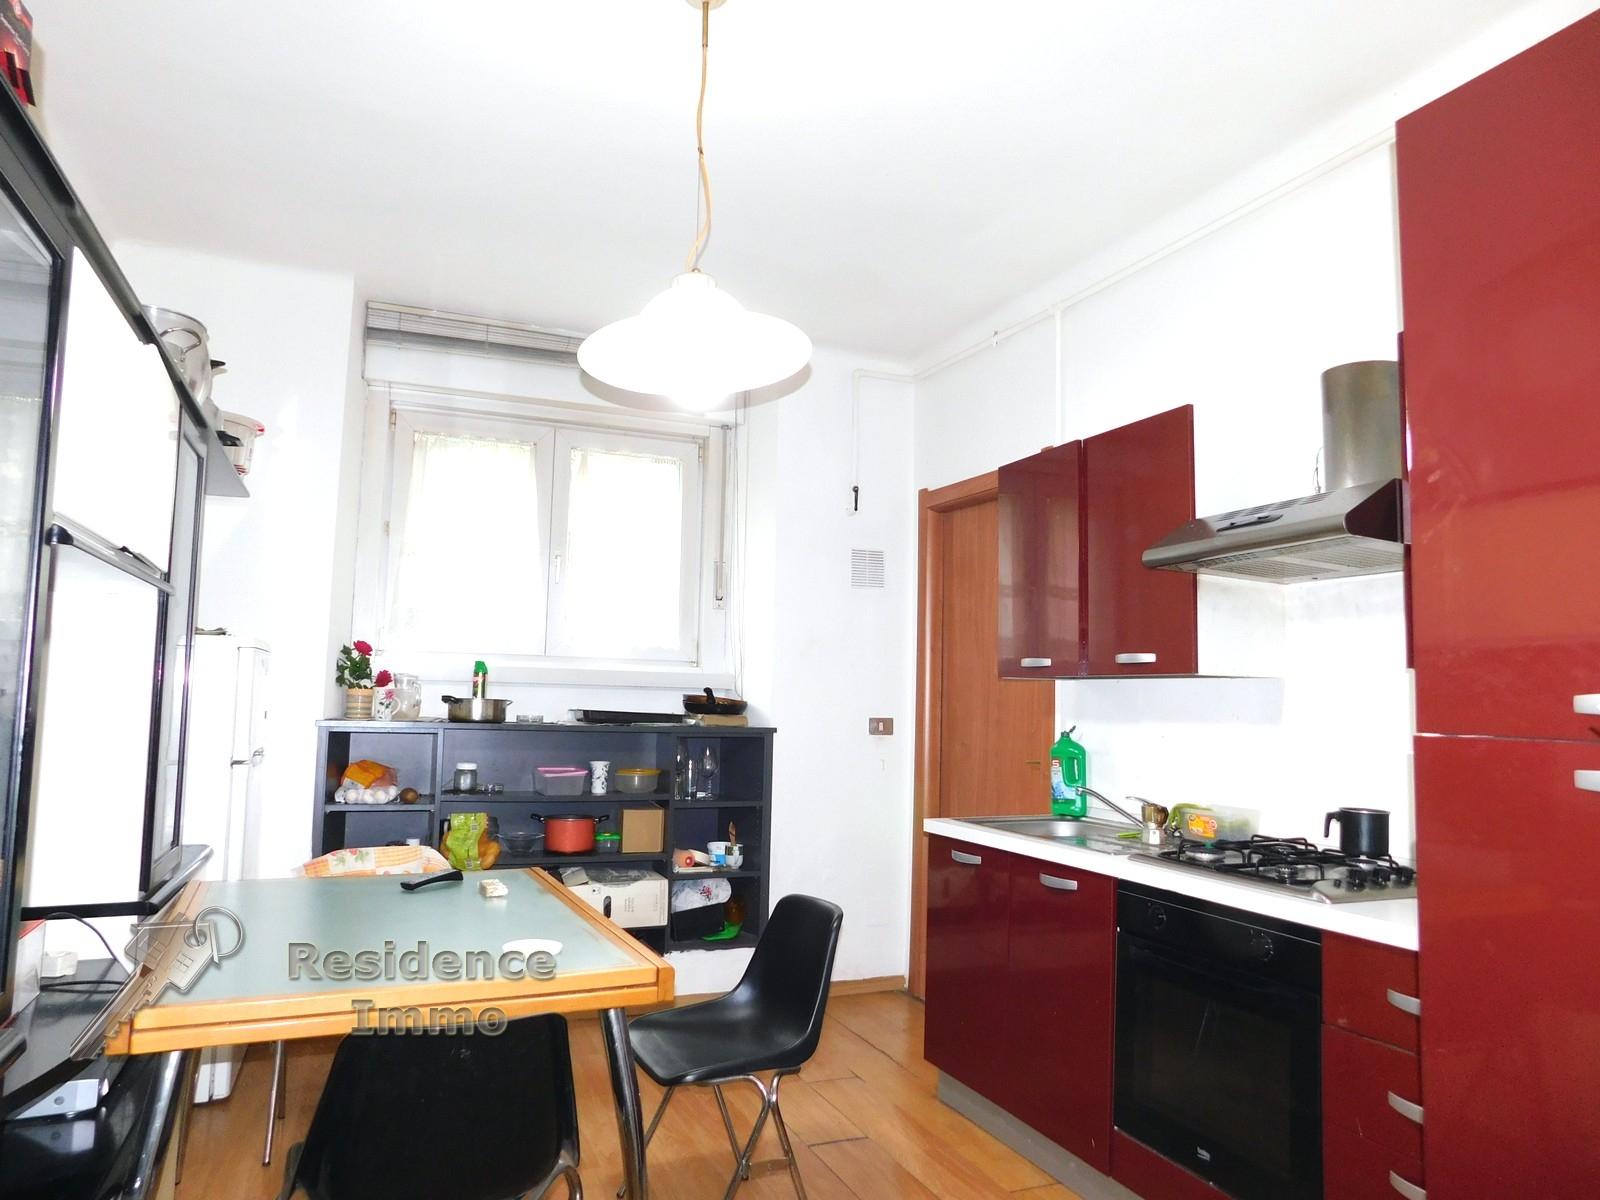 wohnung kaufen in bolzano bozen kodex 2041. Black Bedroom Furniture Sets. Home Design Ideas